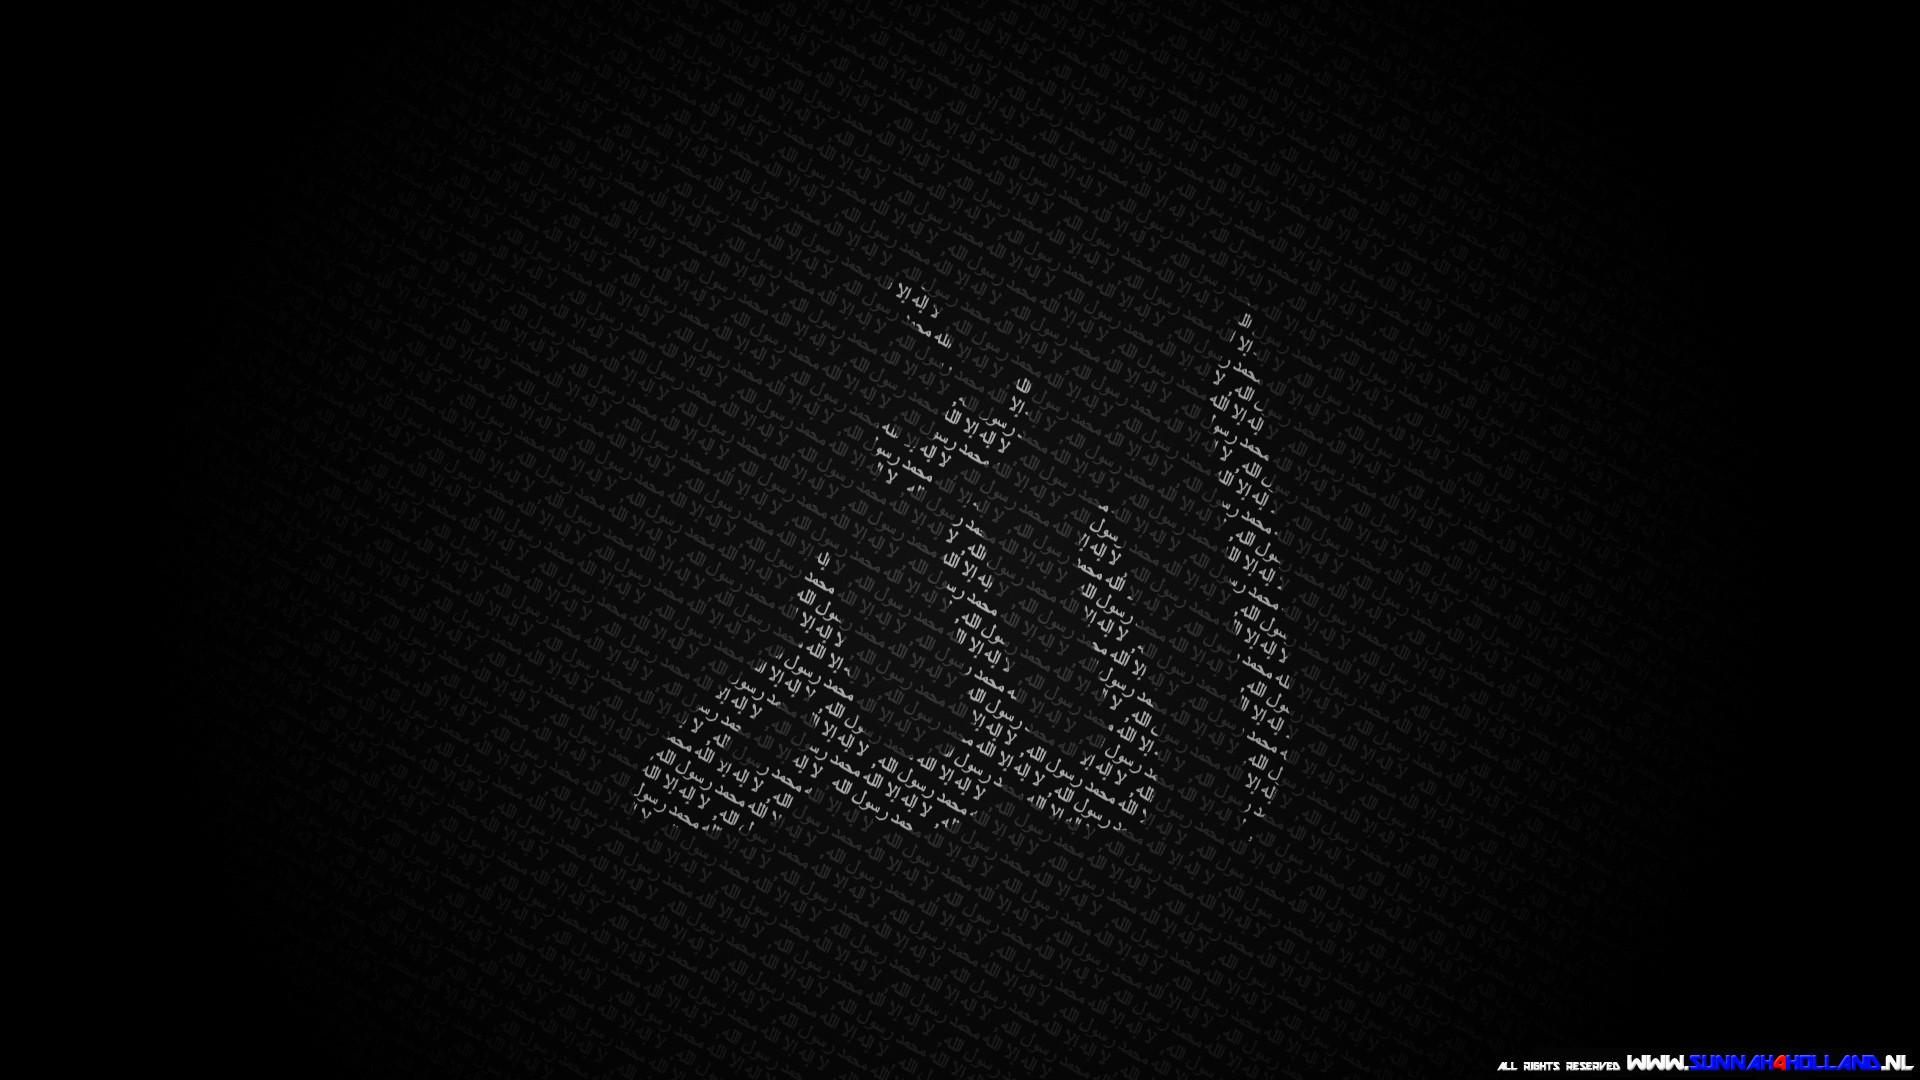 Quran Wallpapers Hd Wallpaper Collections 4kwallpaperwiki